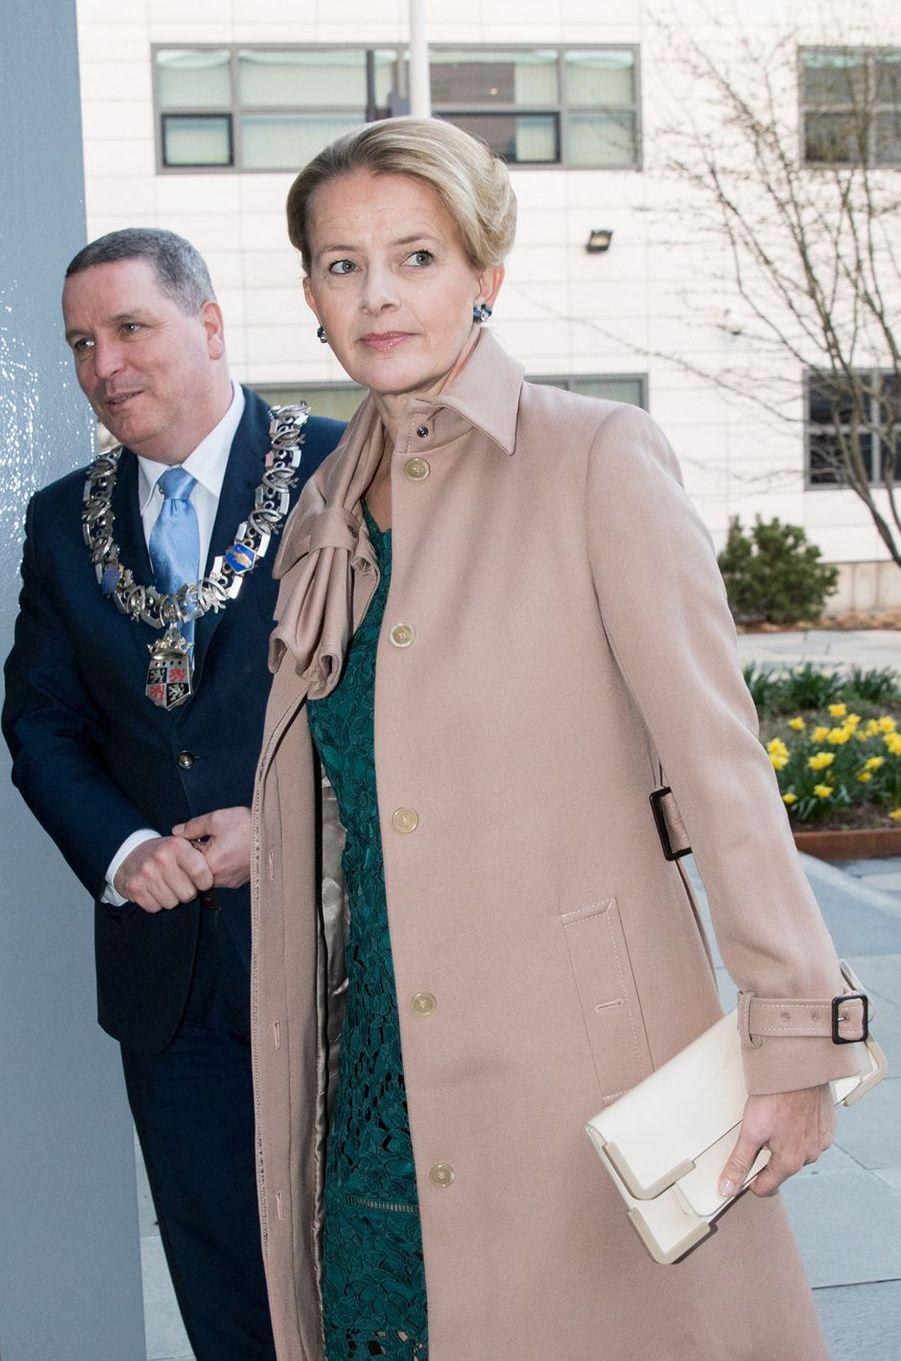 La princesse Mabel d'Oranje-Nassau à Veldhoven, le 18 mars 2019